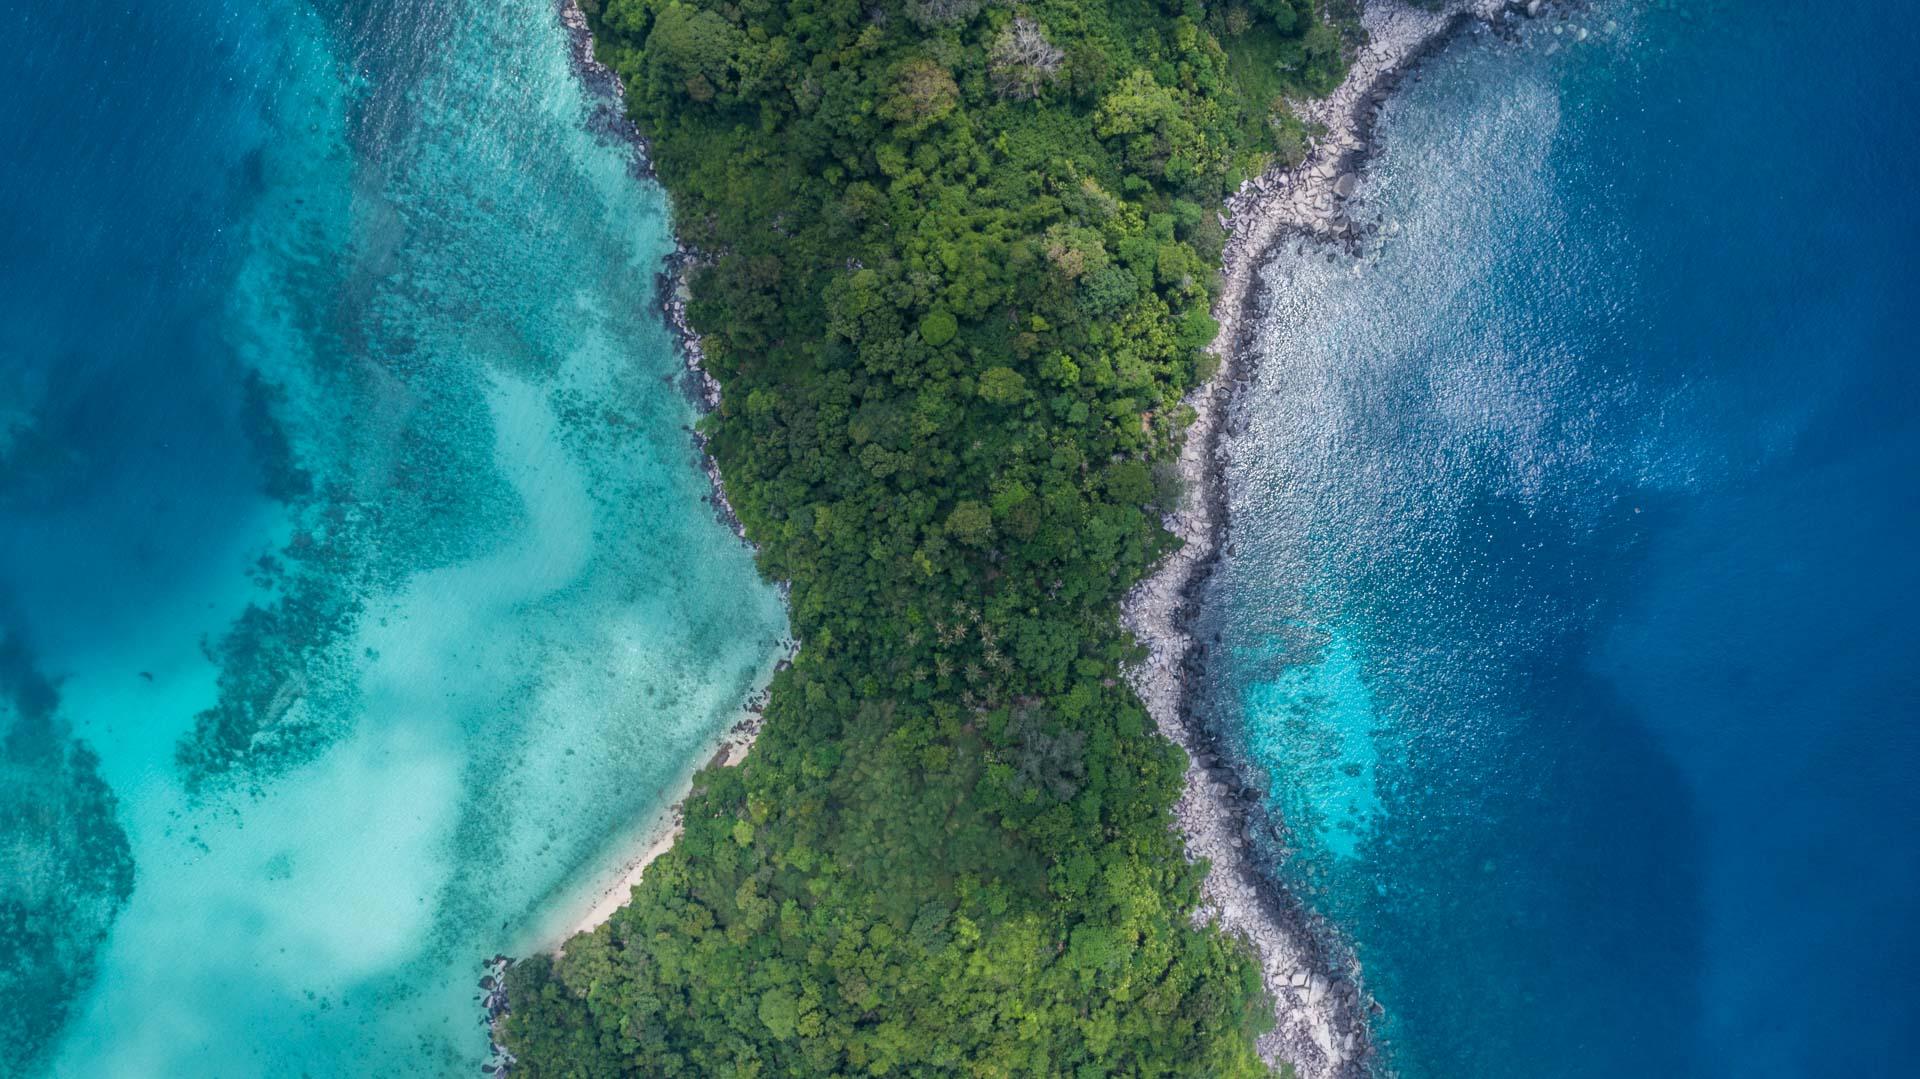 Tioman Island Malaysia Pescart Travel Photo Blog Enrico Pescantini Coral Island aerial view drone 3